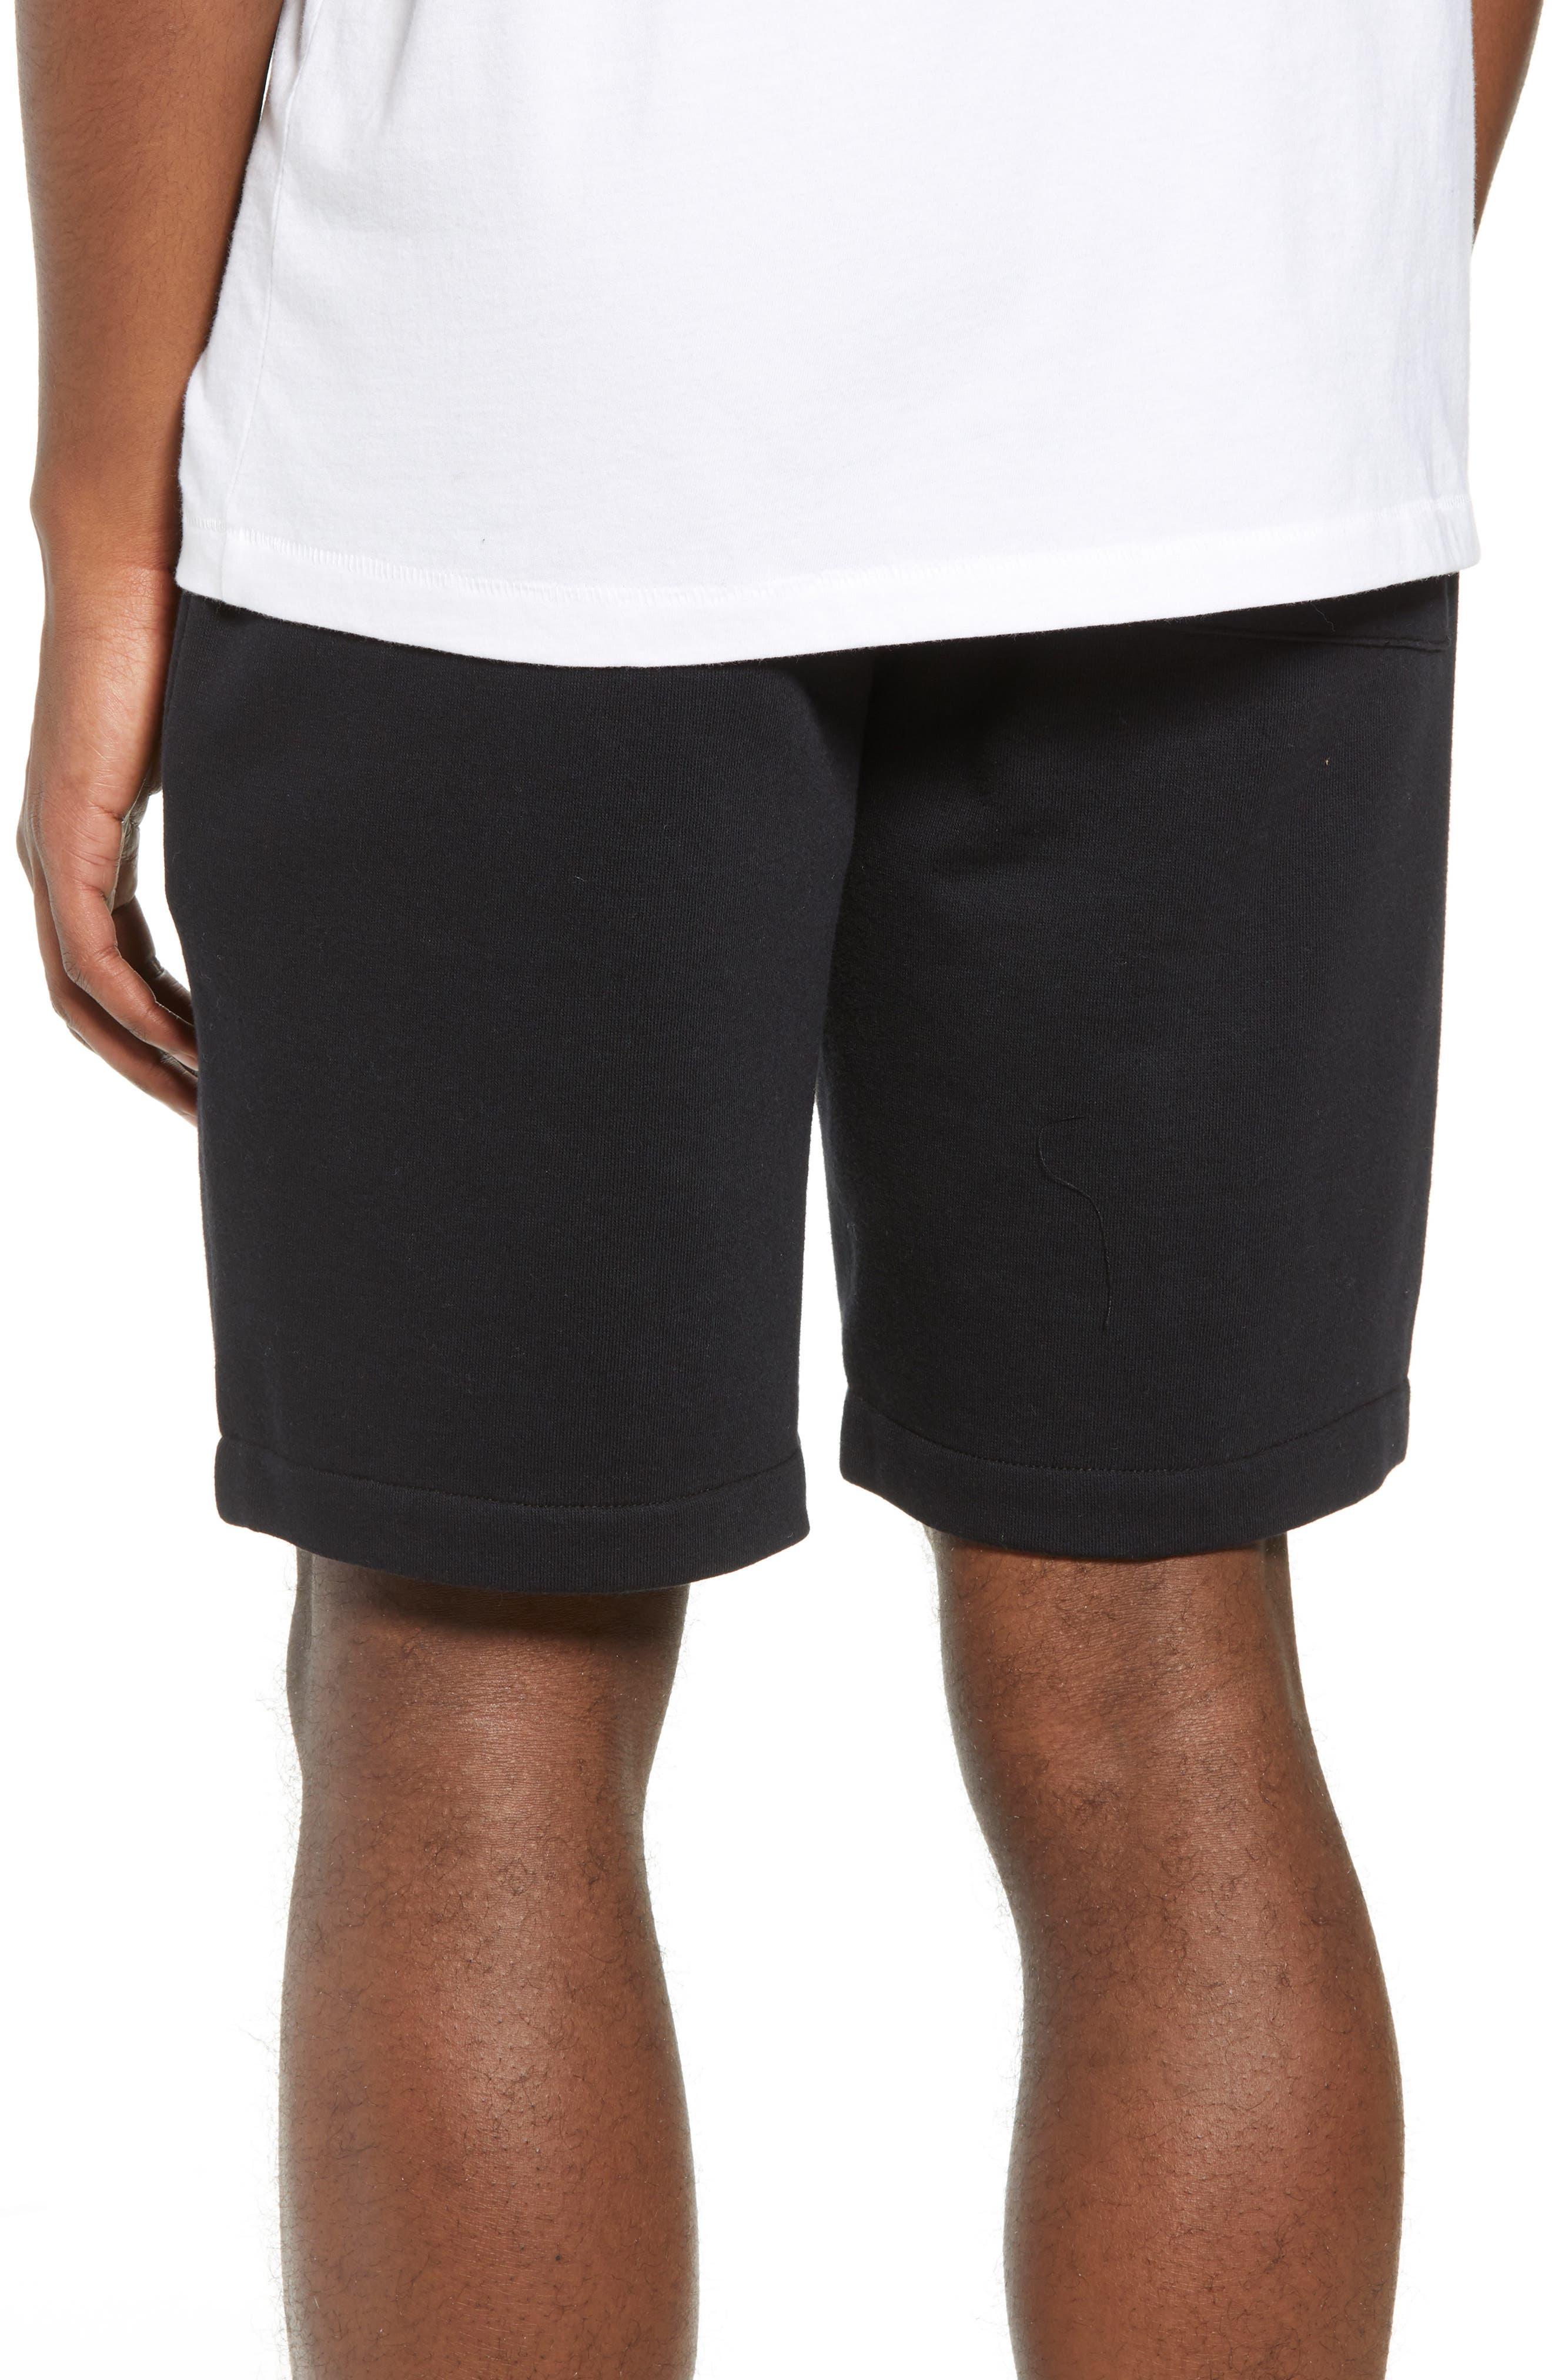 THE RAIL,                             Fleece Shorts,                             Alternate thumbnail 2, color,                             001